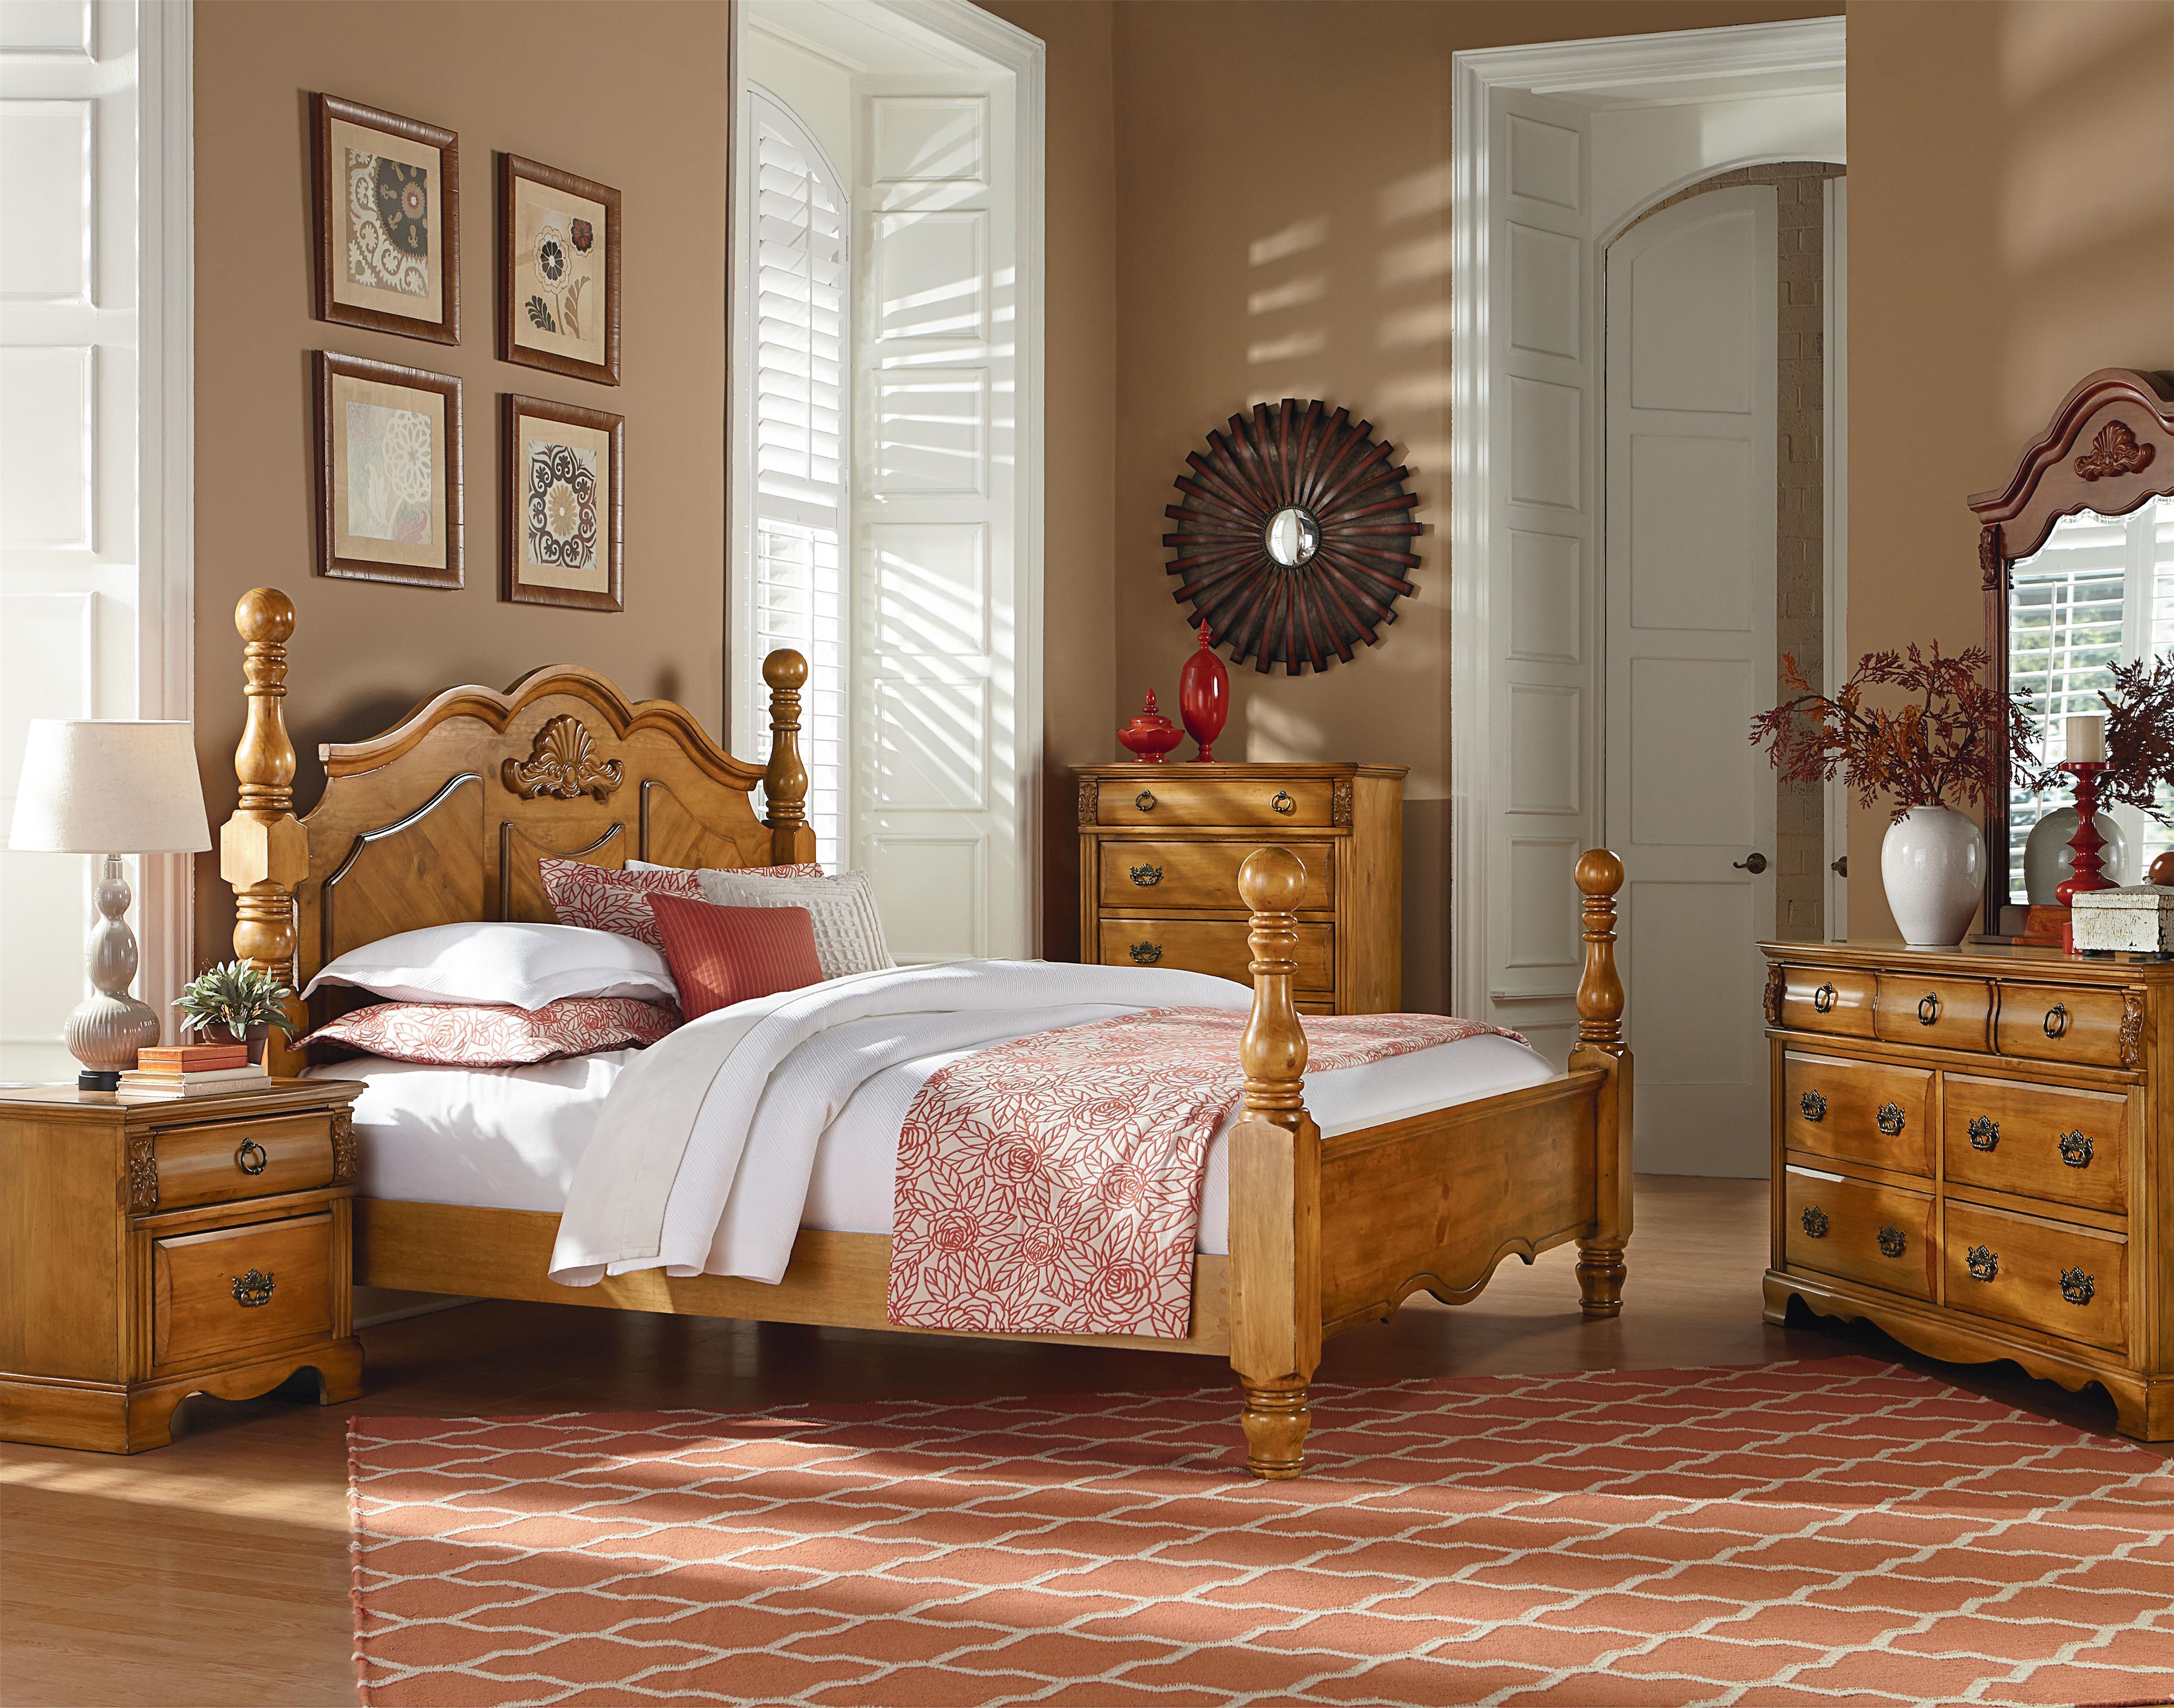 Standard Furniture Georgetown Queen Bedroom Group - Item Number: 83000 Q Bedroom Group 1